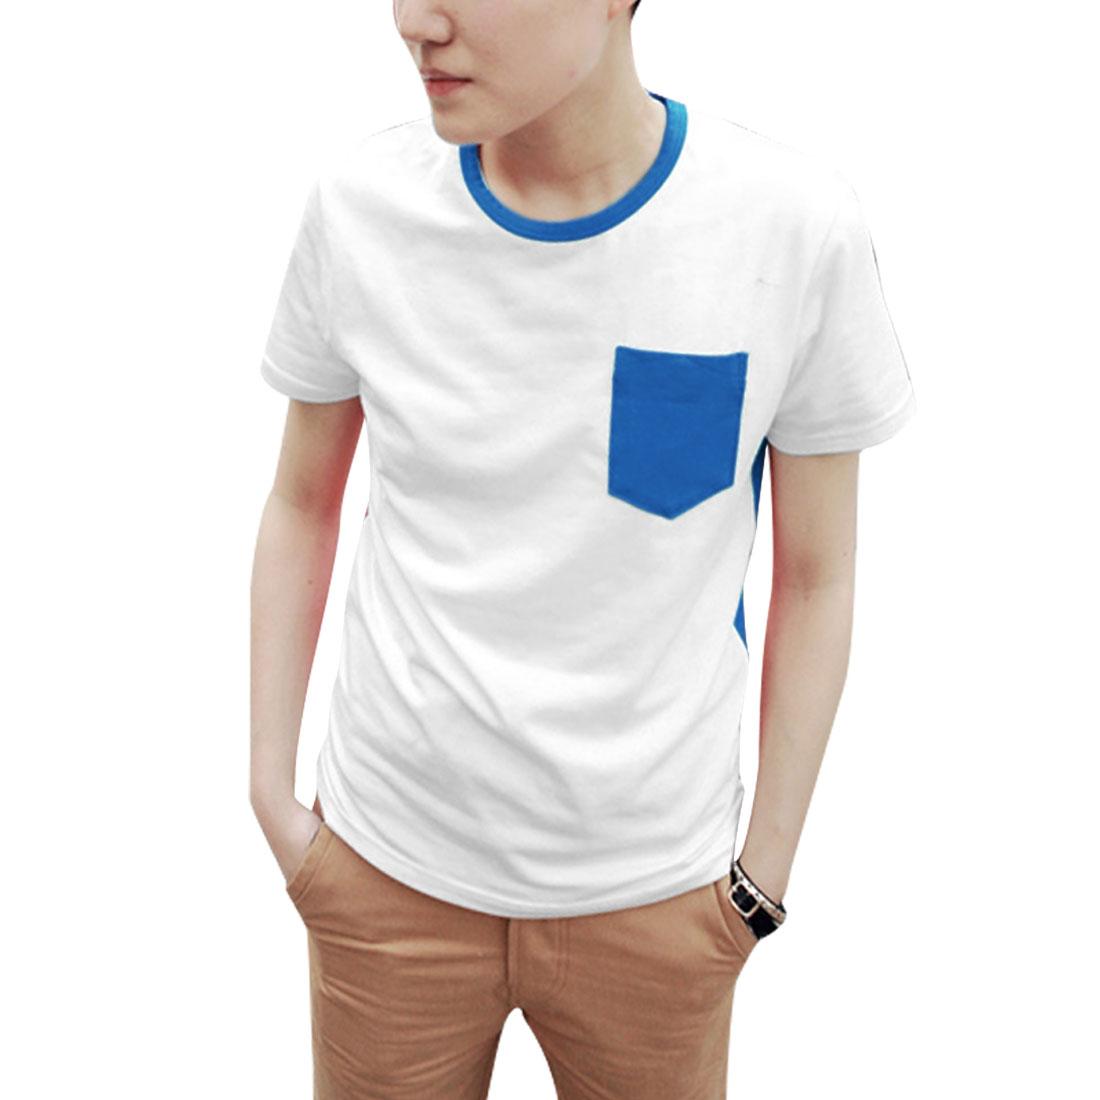 Mens Short Sleeve Splice Chest Patch Pocket Royalblue White Shirt M